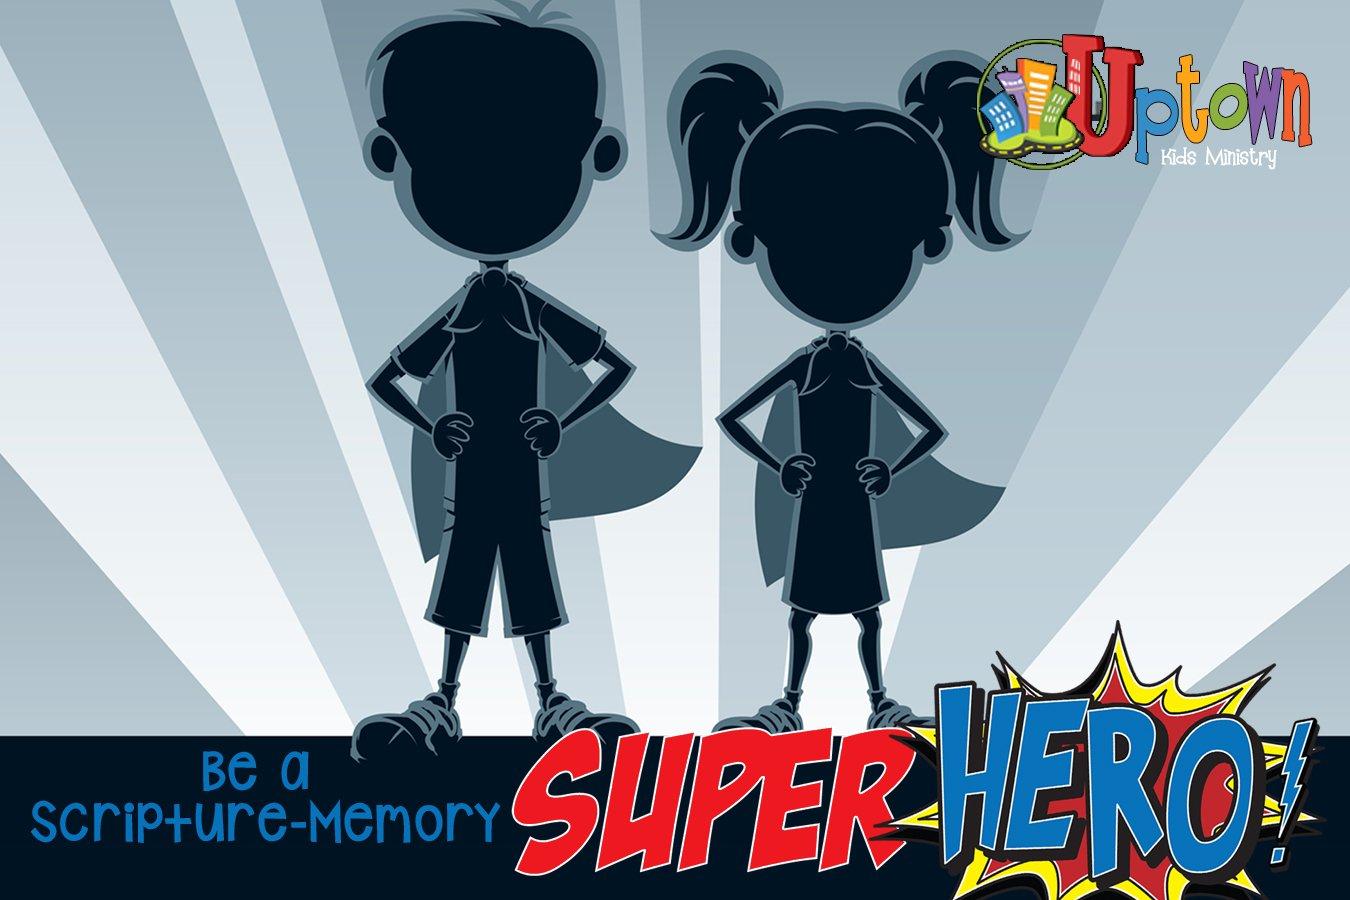 Be a Scripture-Memory Super Hero!